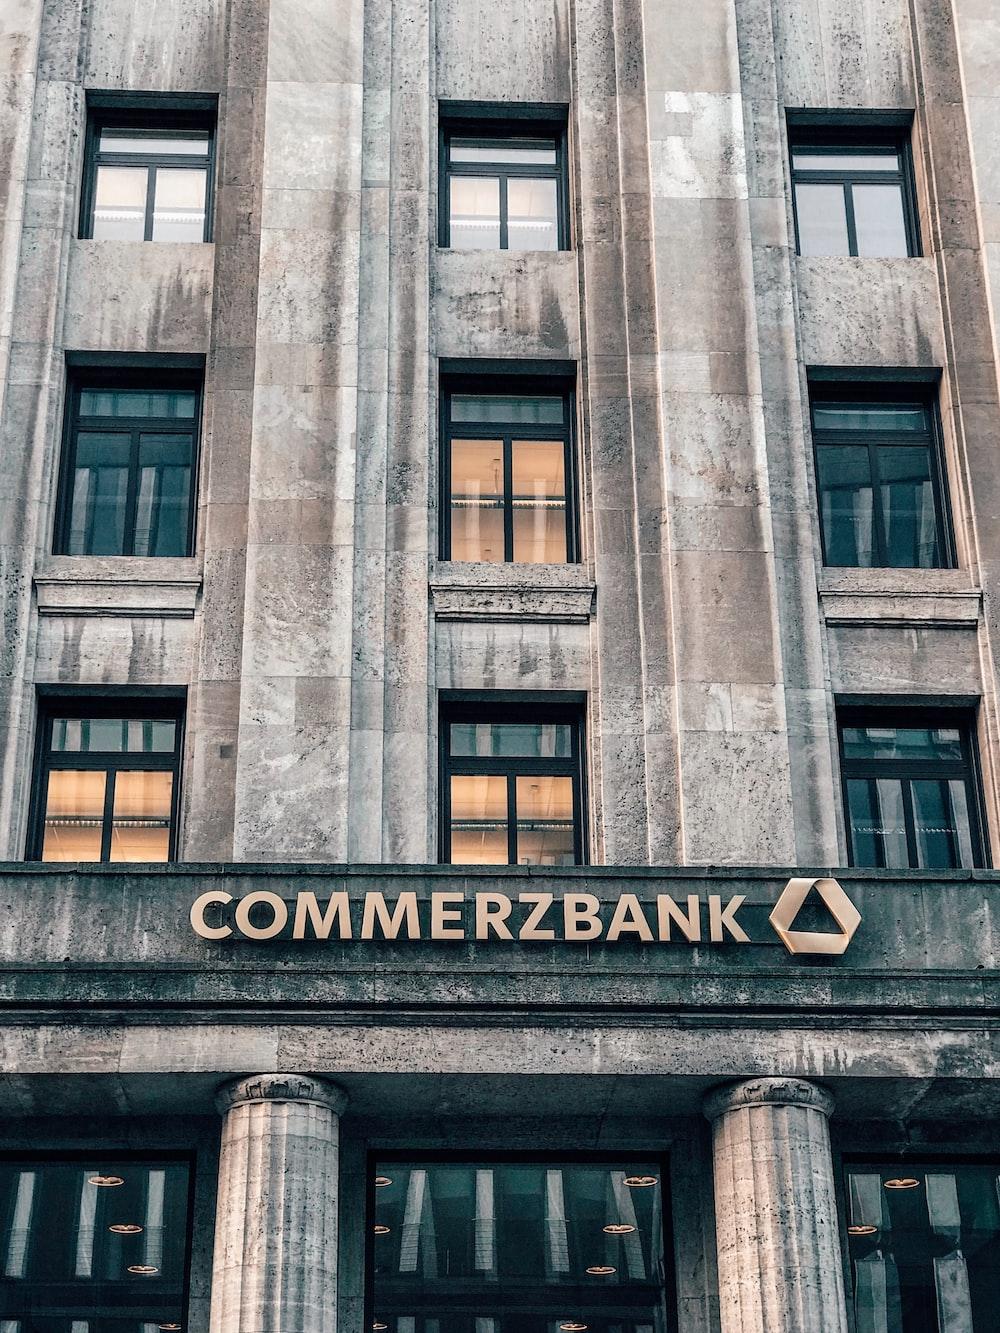 Commerxbank establishment